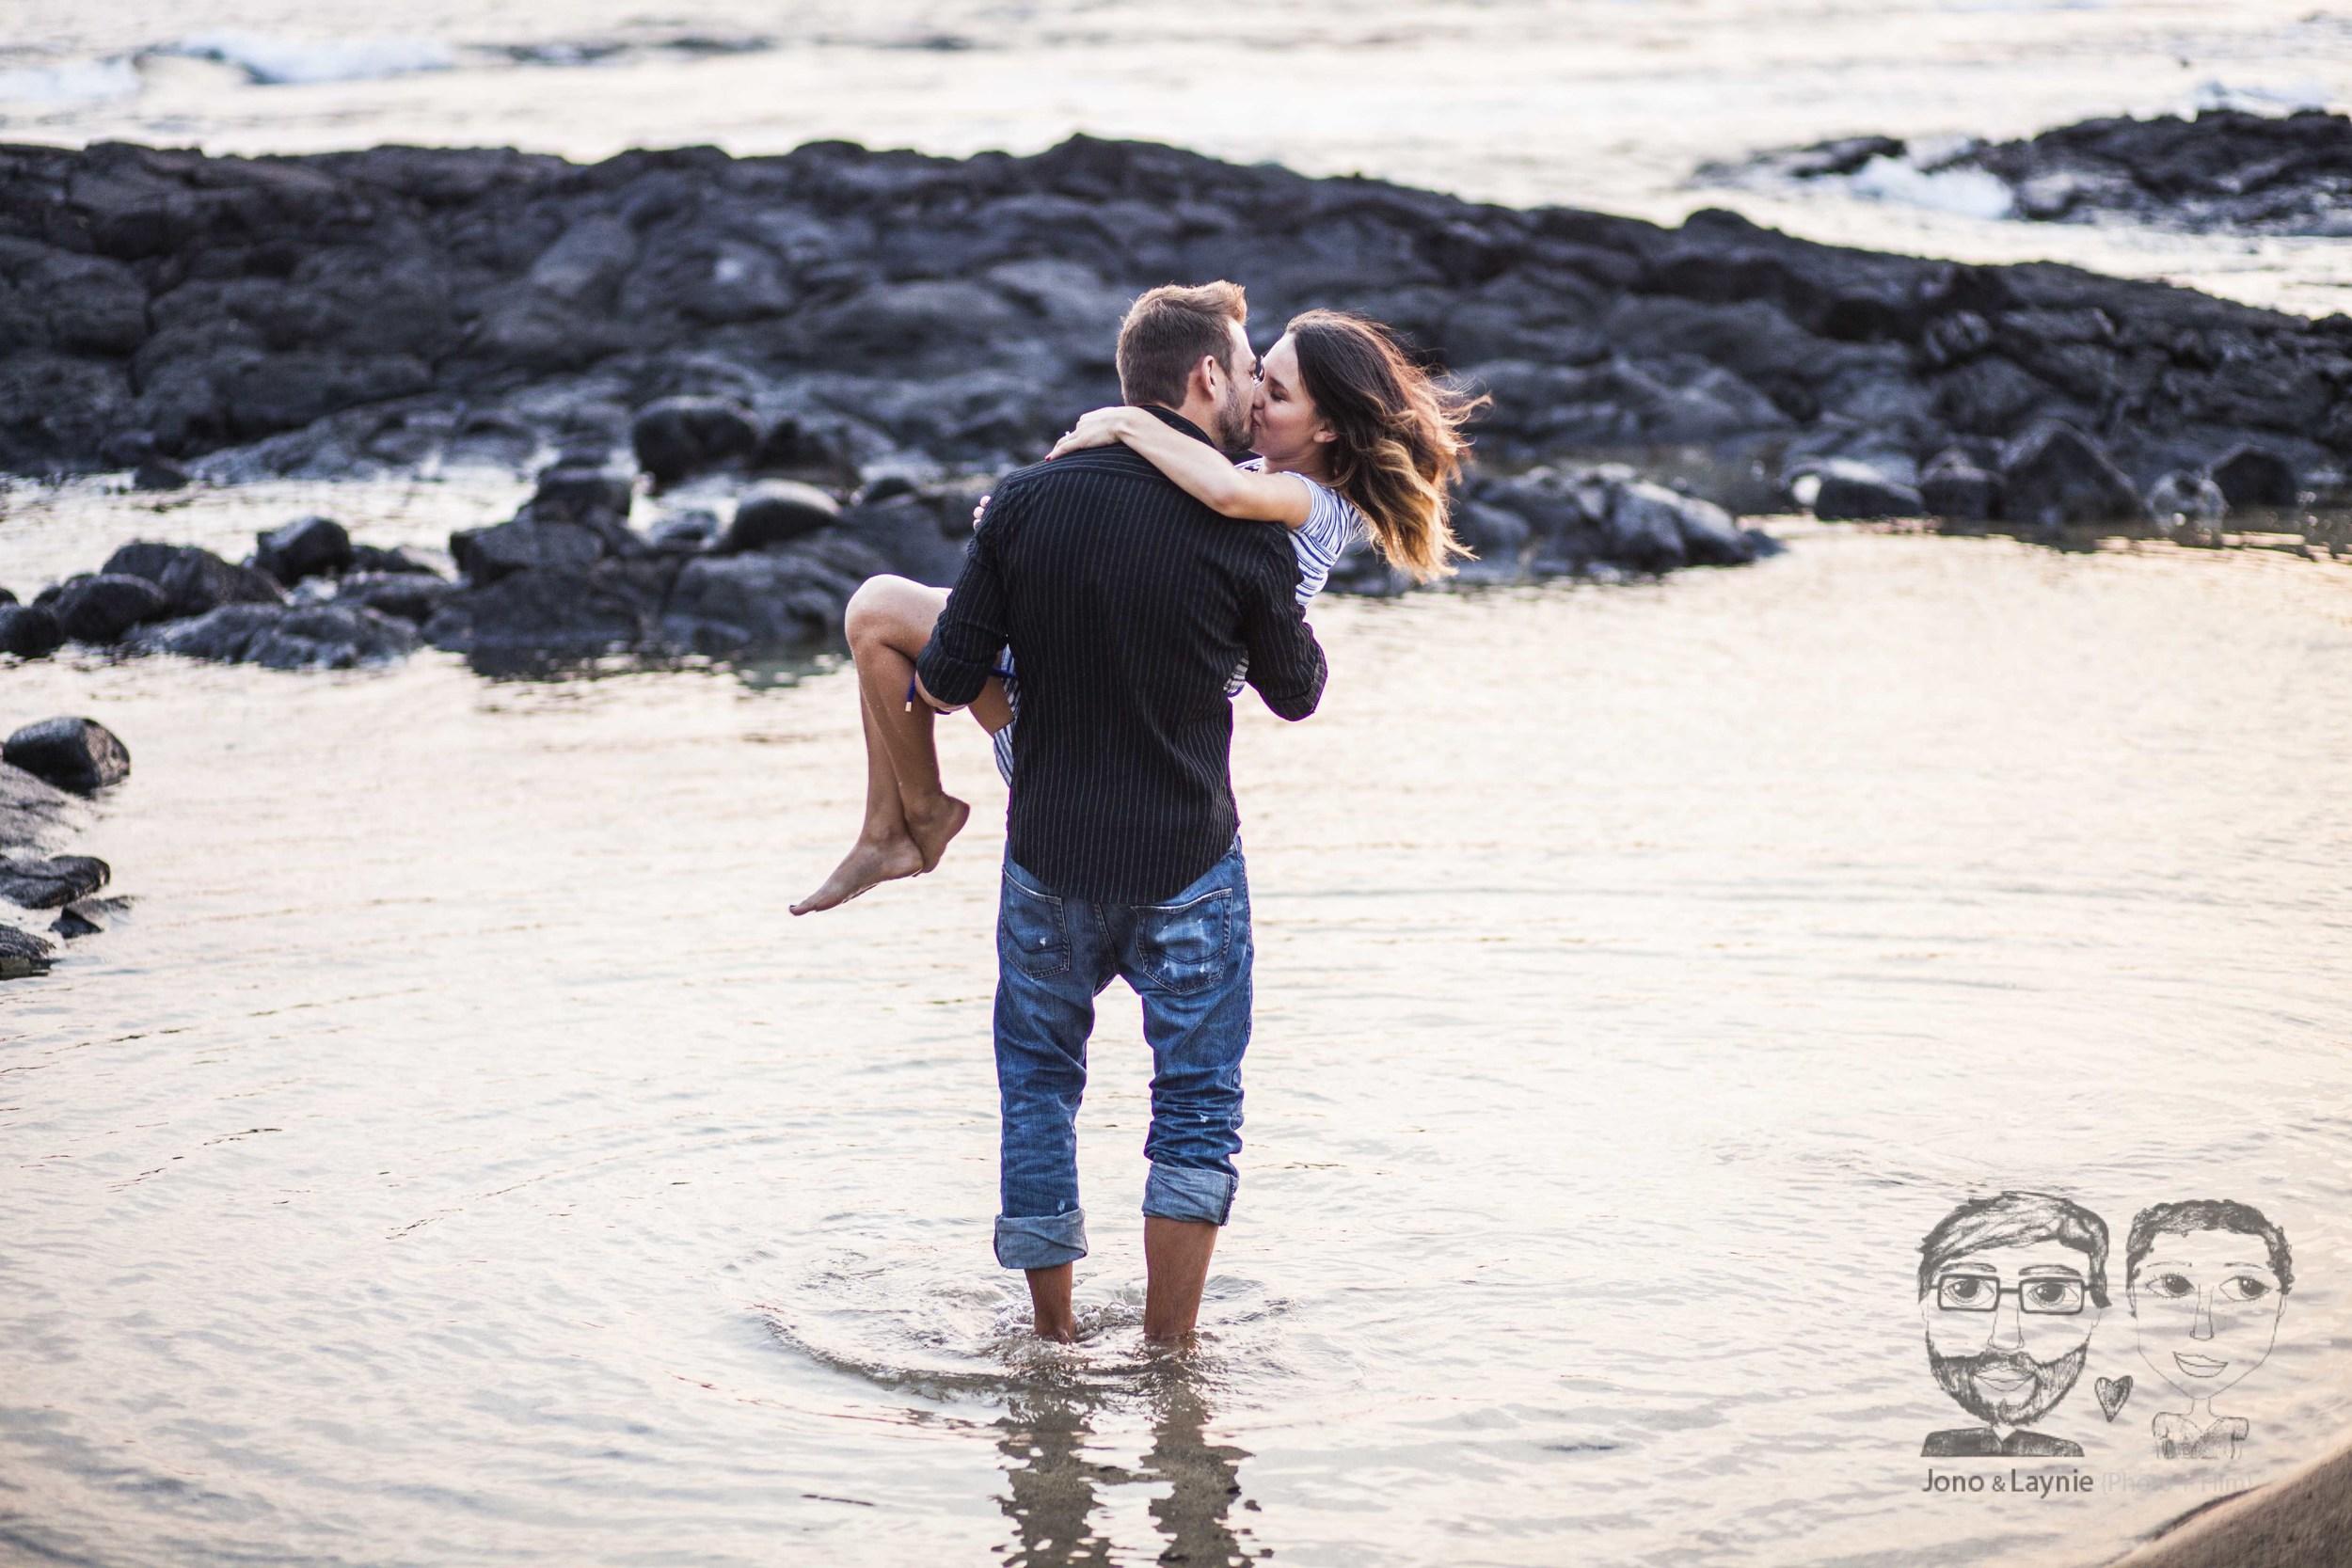 Jono & Laynie Co.-Kona, Hawaii-Engagement Session41.jpg